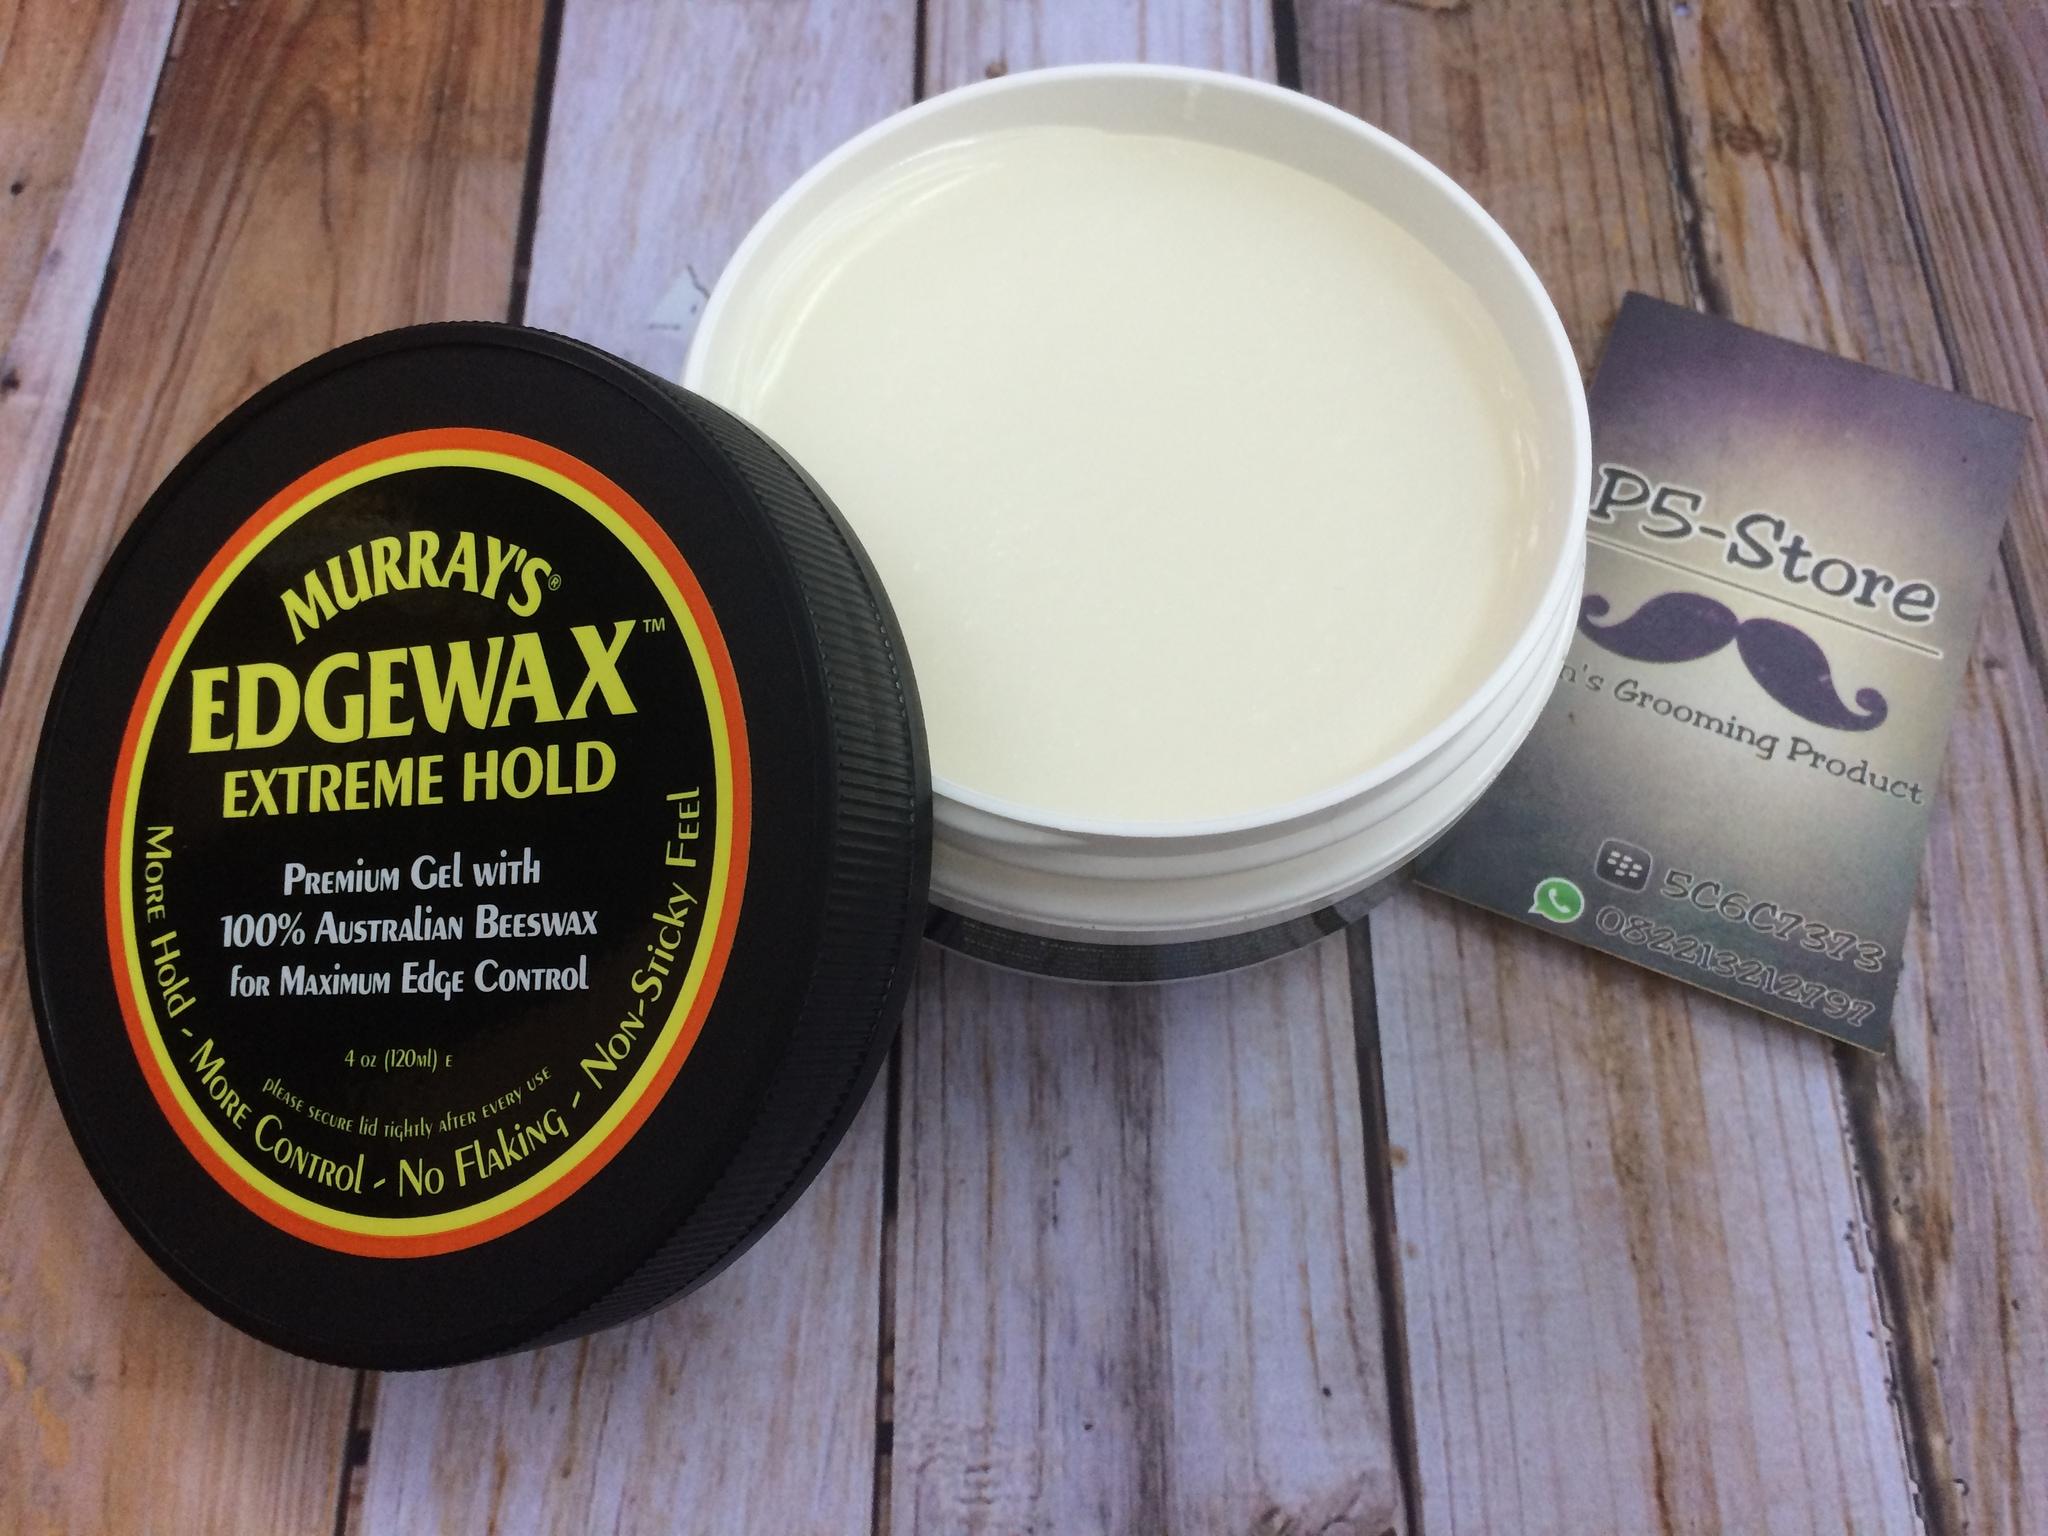 Murrays Edgewax Extreme Pomade 4 Oz Daftar Harga Terbaru Dan Water Based Original  Grosir Jual Murray S Waterbased Hold Panglima Store Tokopedia